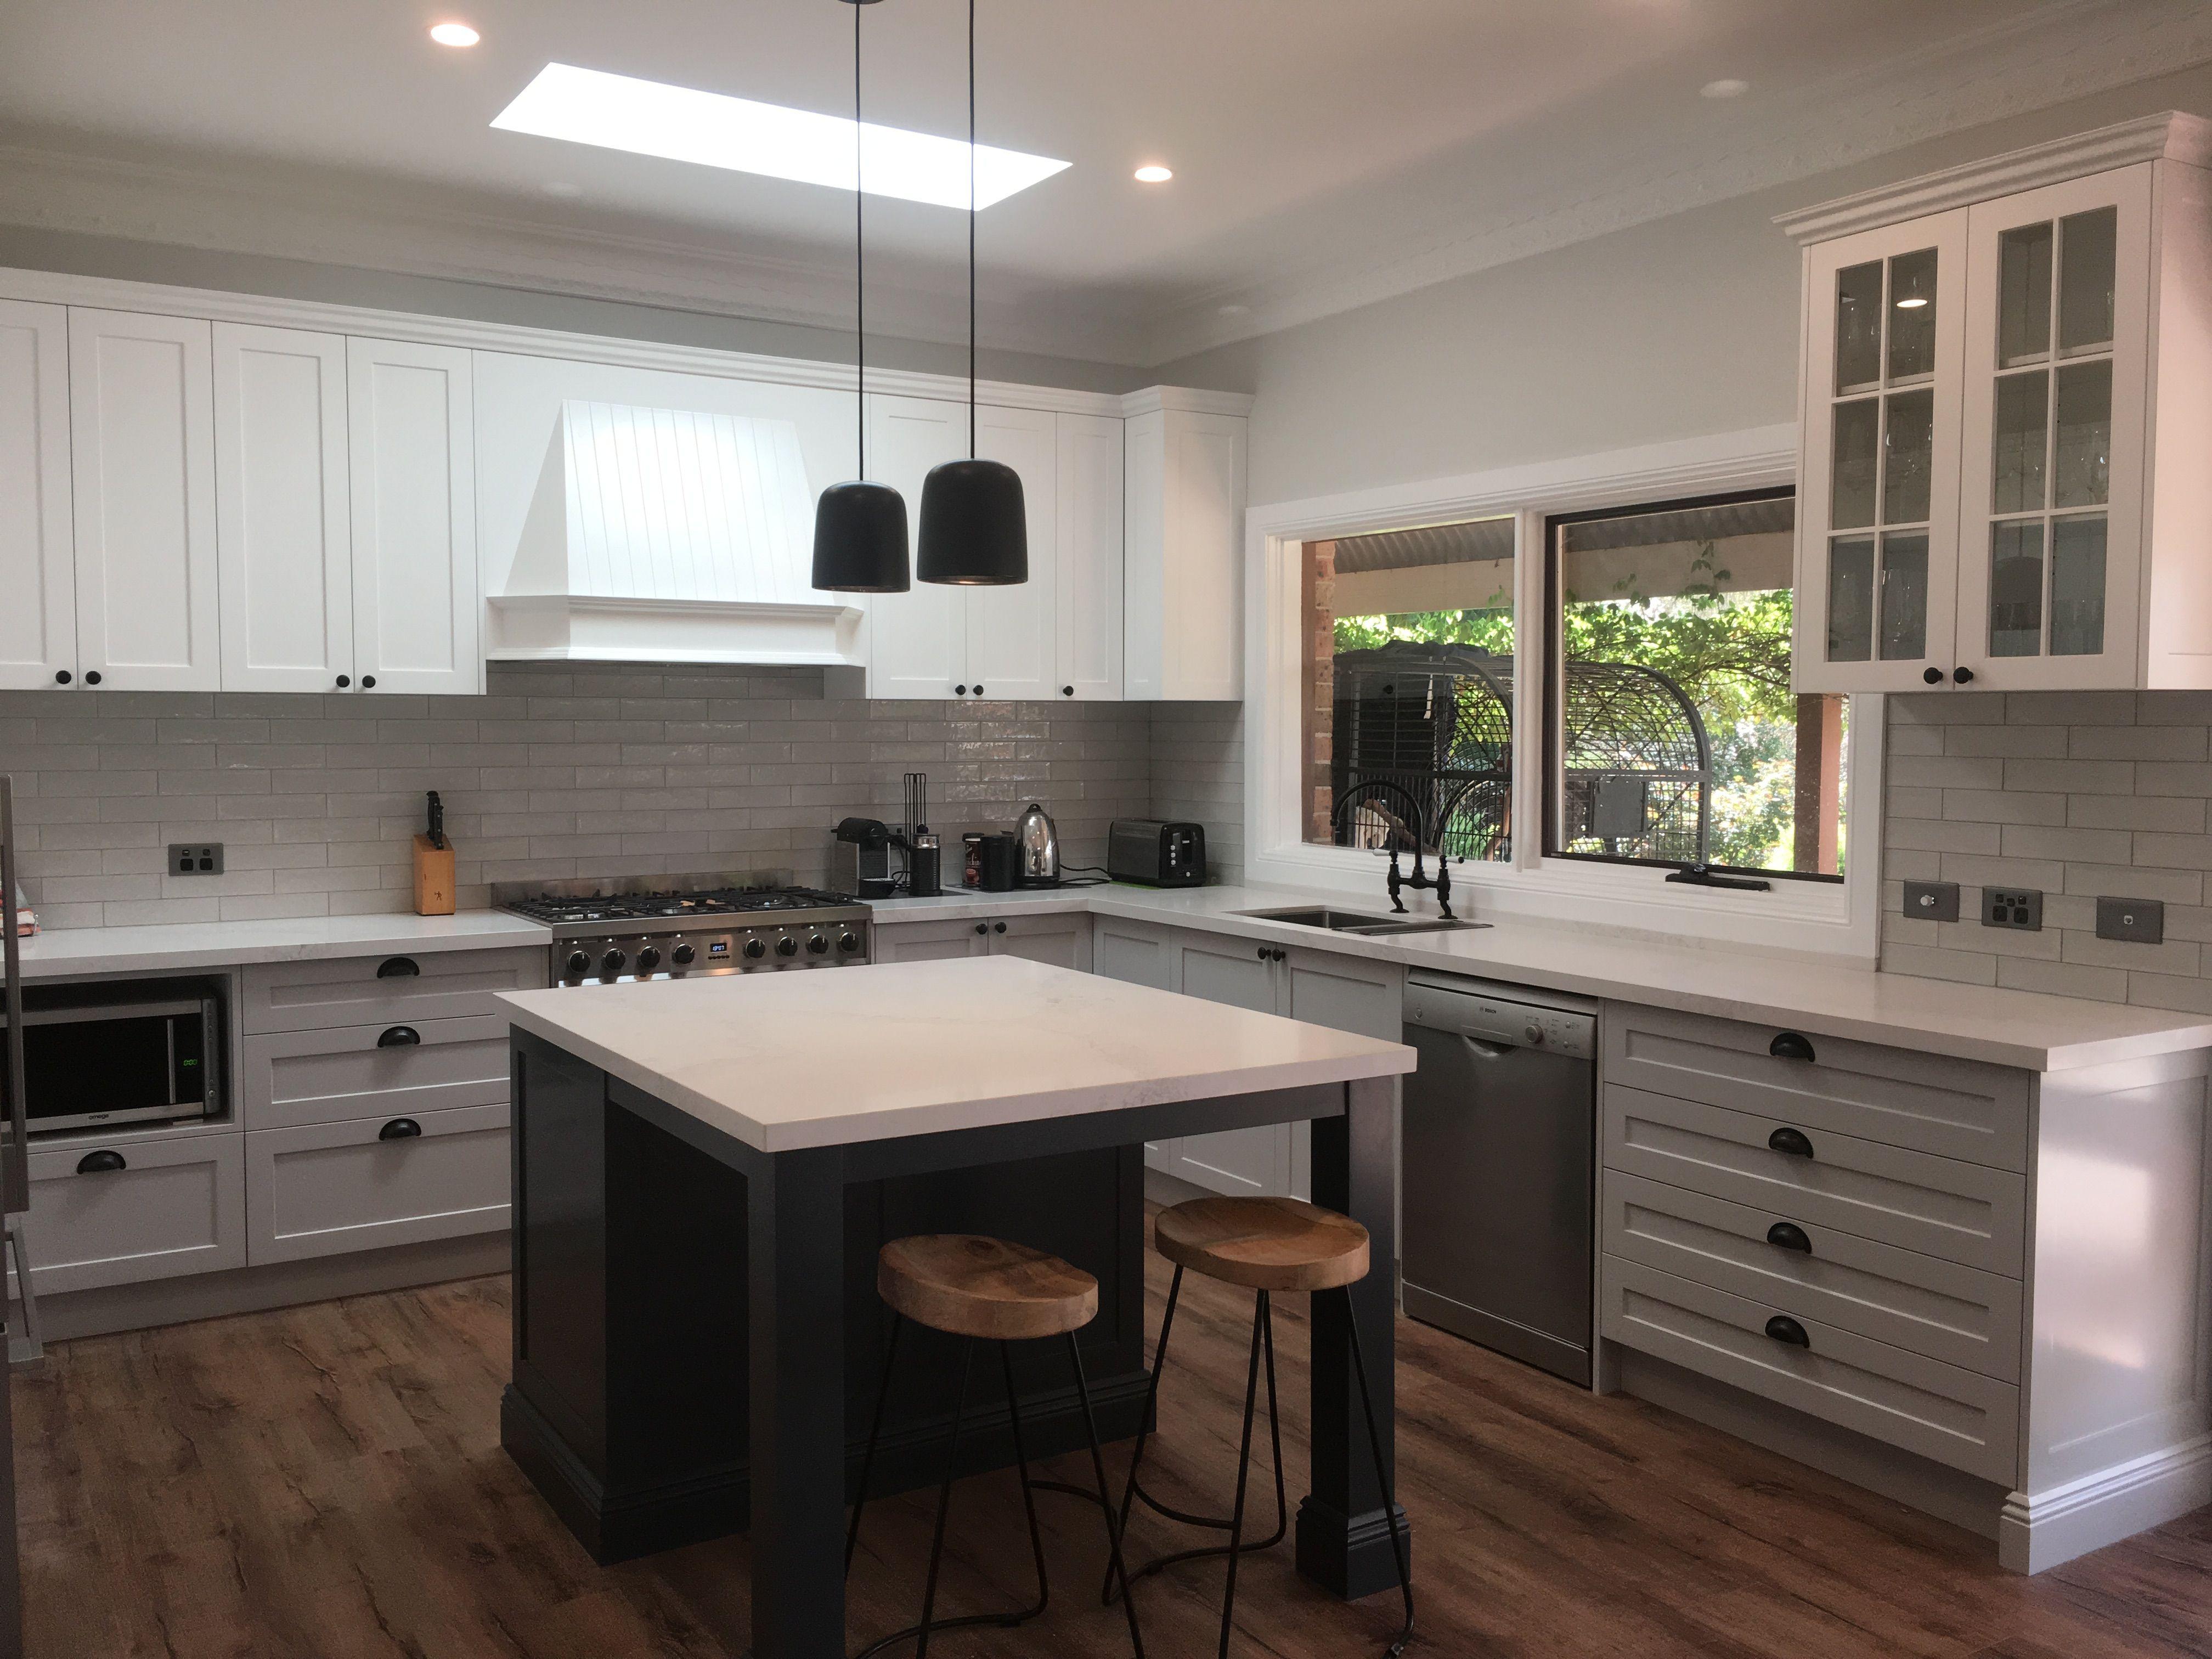 Shaker Kitchen Cabinets Provincial Kitchens Australian Made Shaker Style Kitchens Modern Design Stil